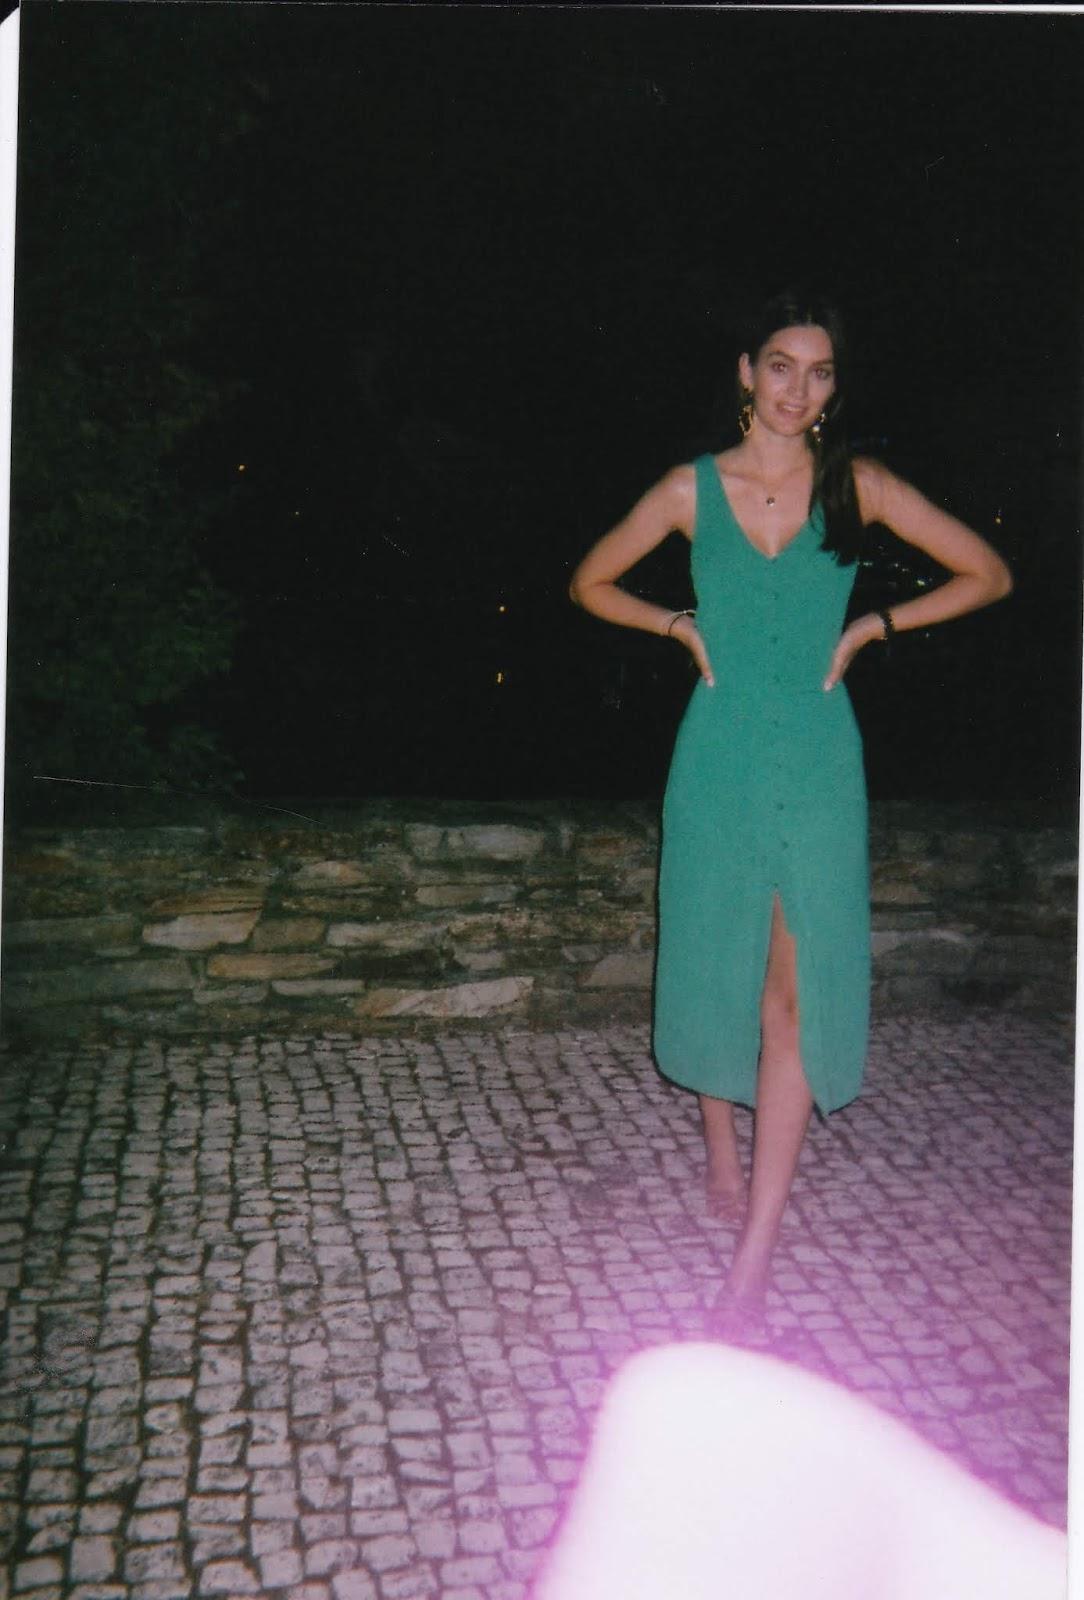 peexo portugal film camera summer